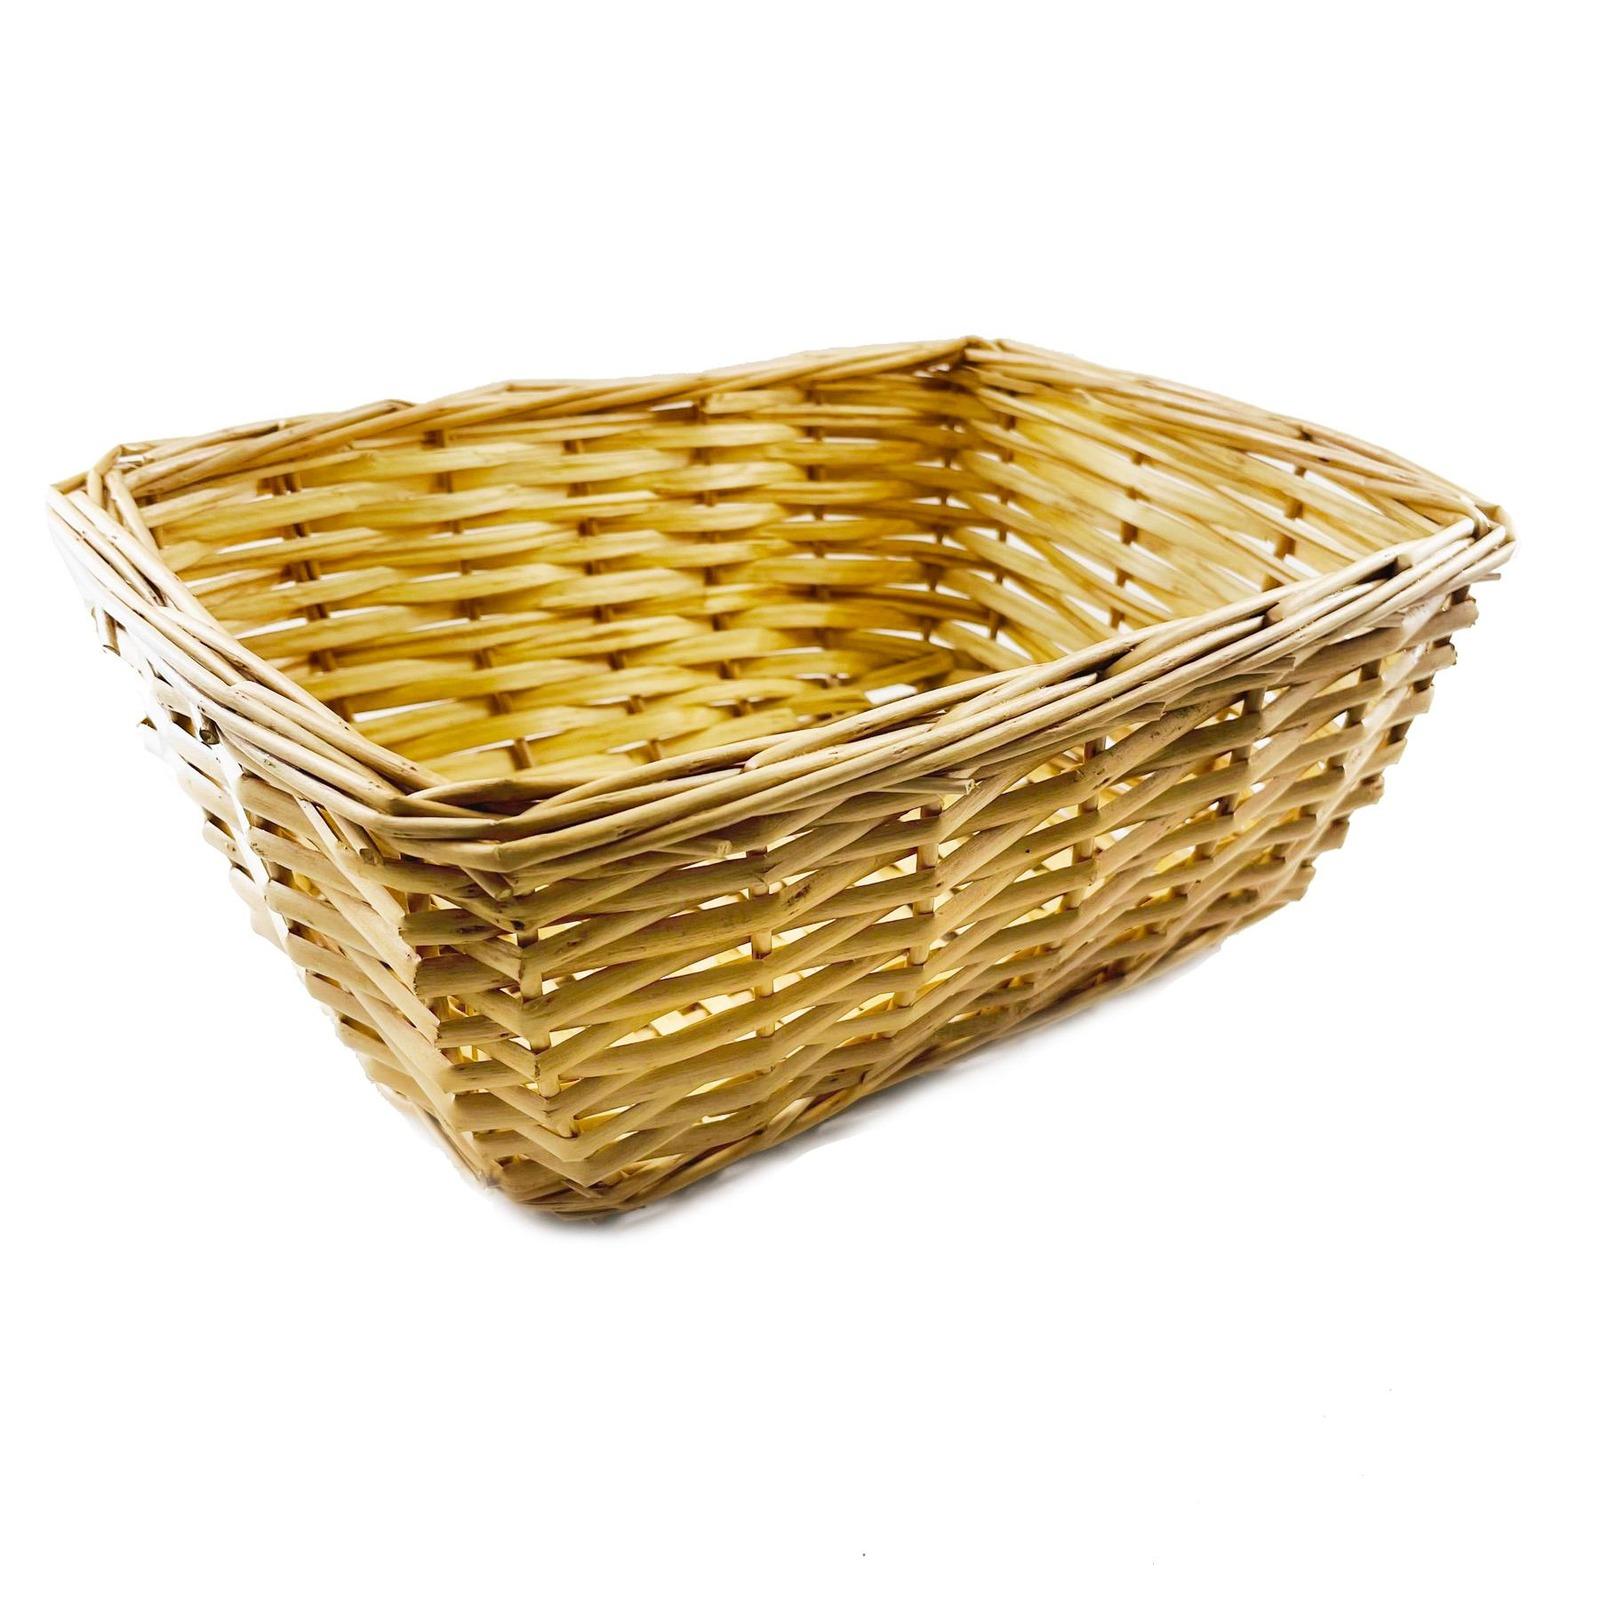 The Paper Stone Cloth Rattan Basket with Cat Prints - Medium